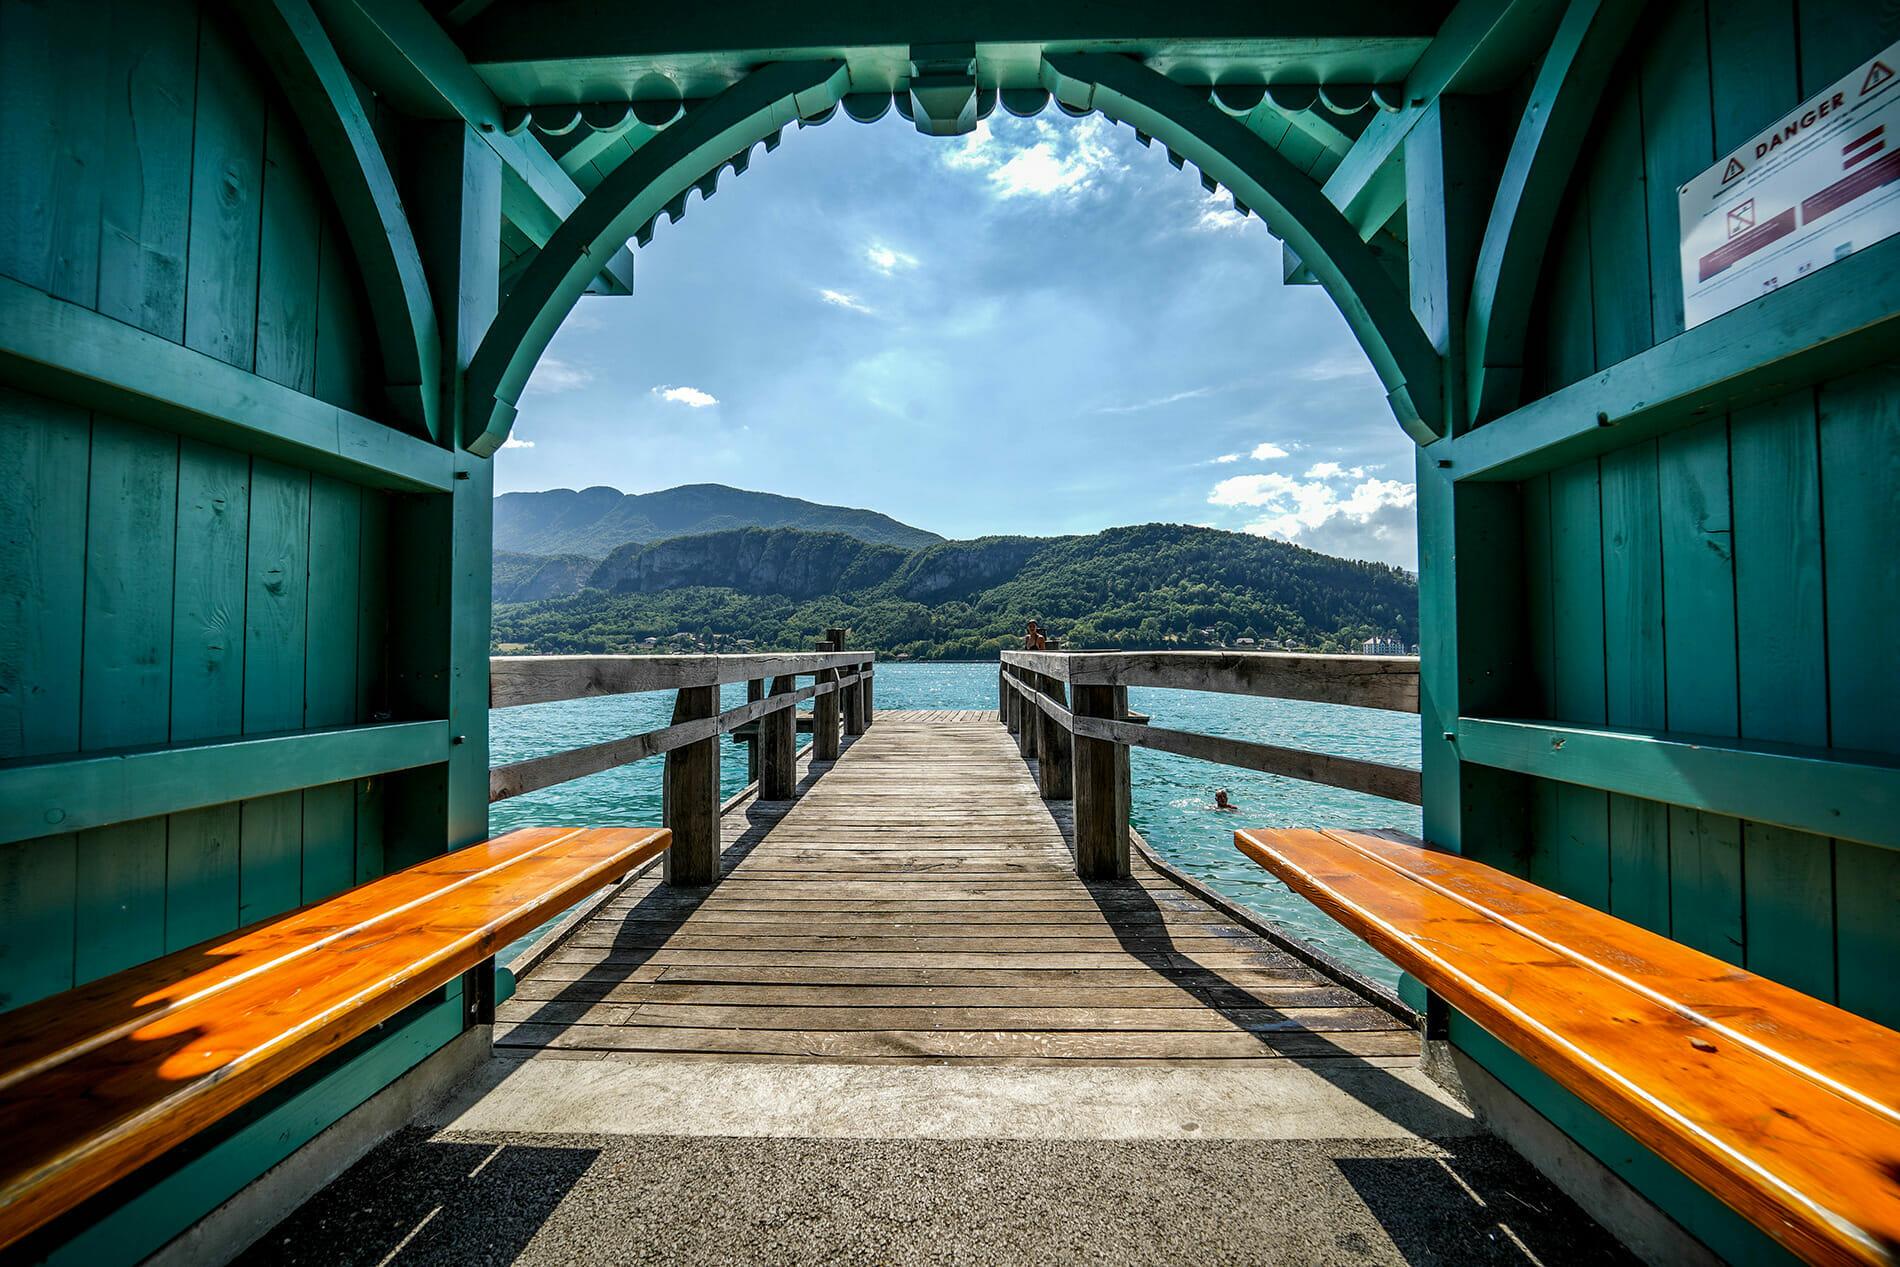 Environnement ponton lac d'Annecy